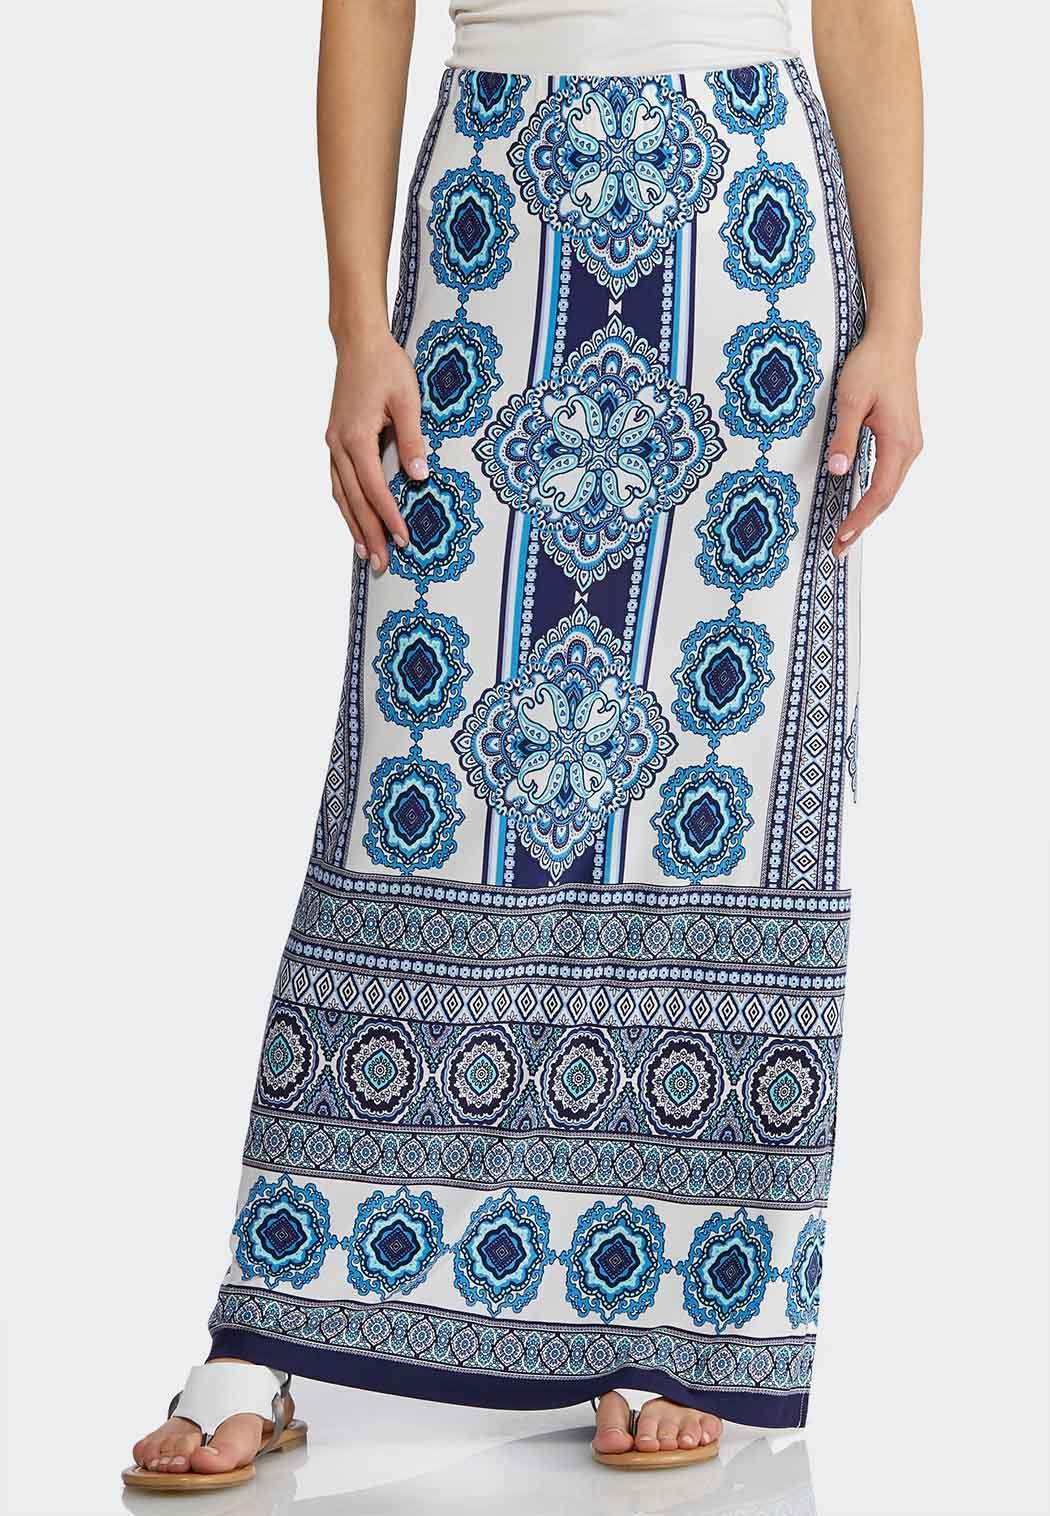 6a10cd4e8055d Plus Size Blue Medallion Maxi Skirt Maxi Cato Fashions